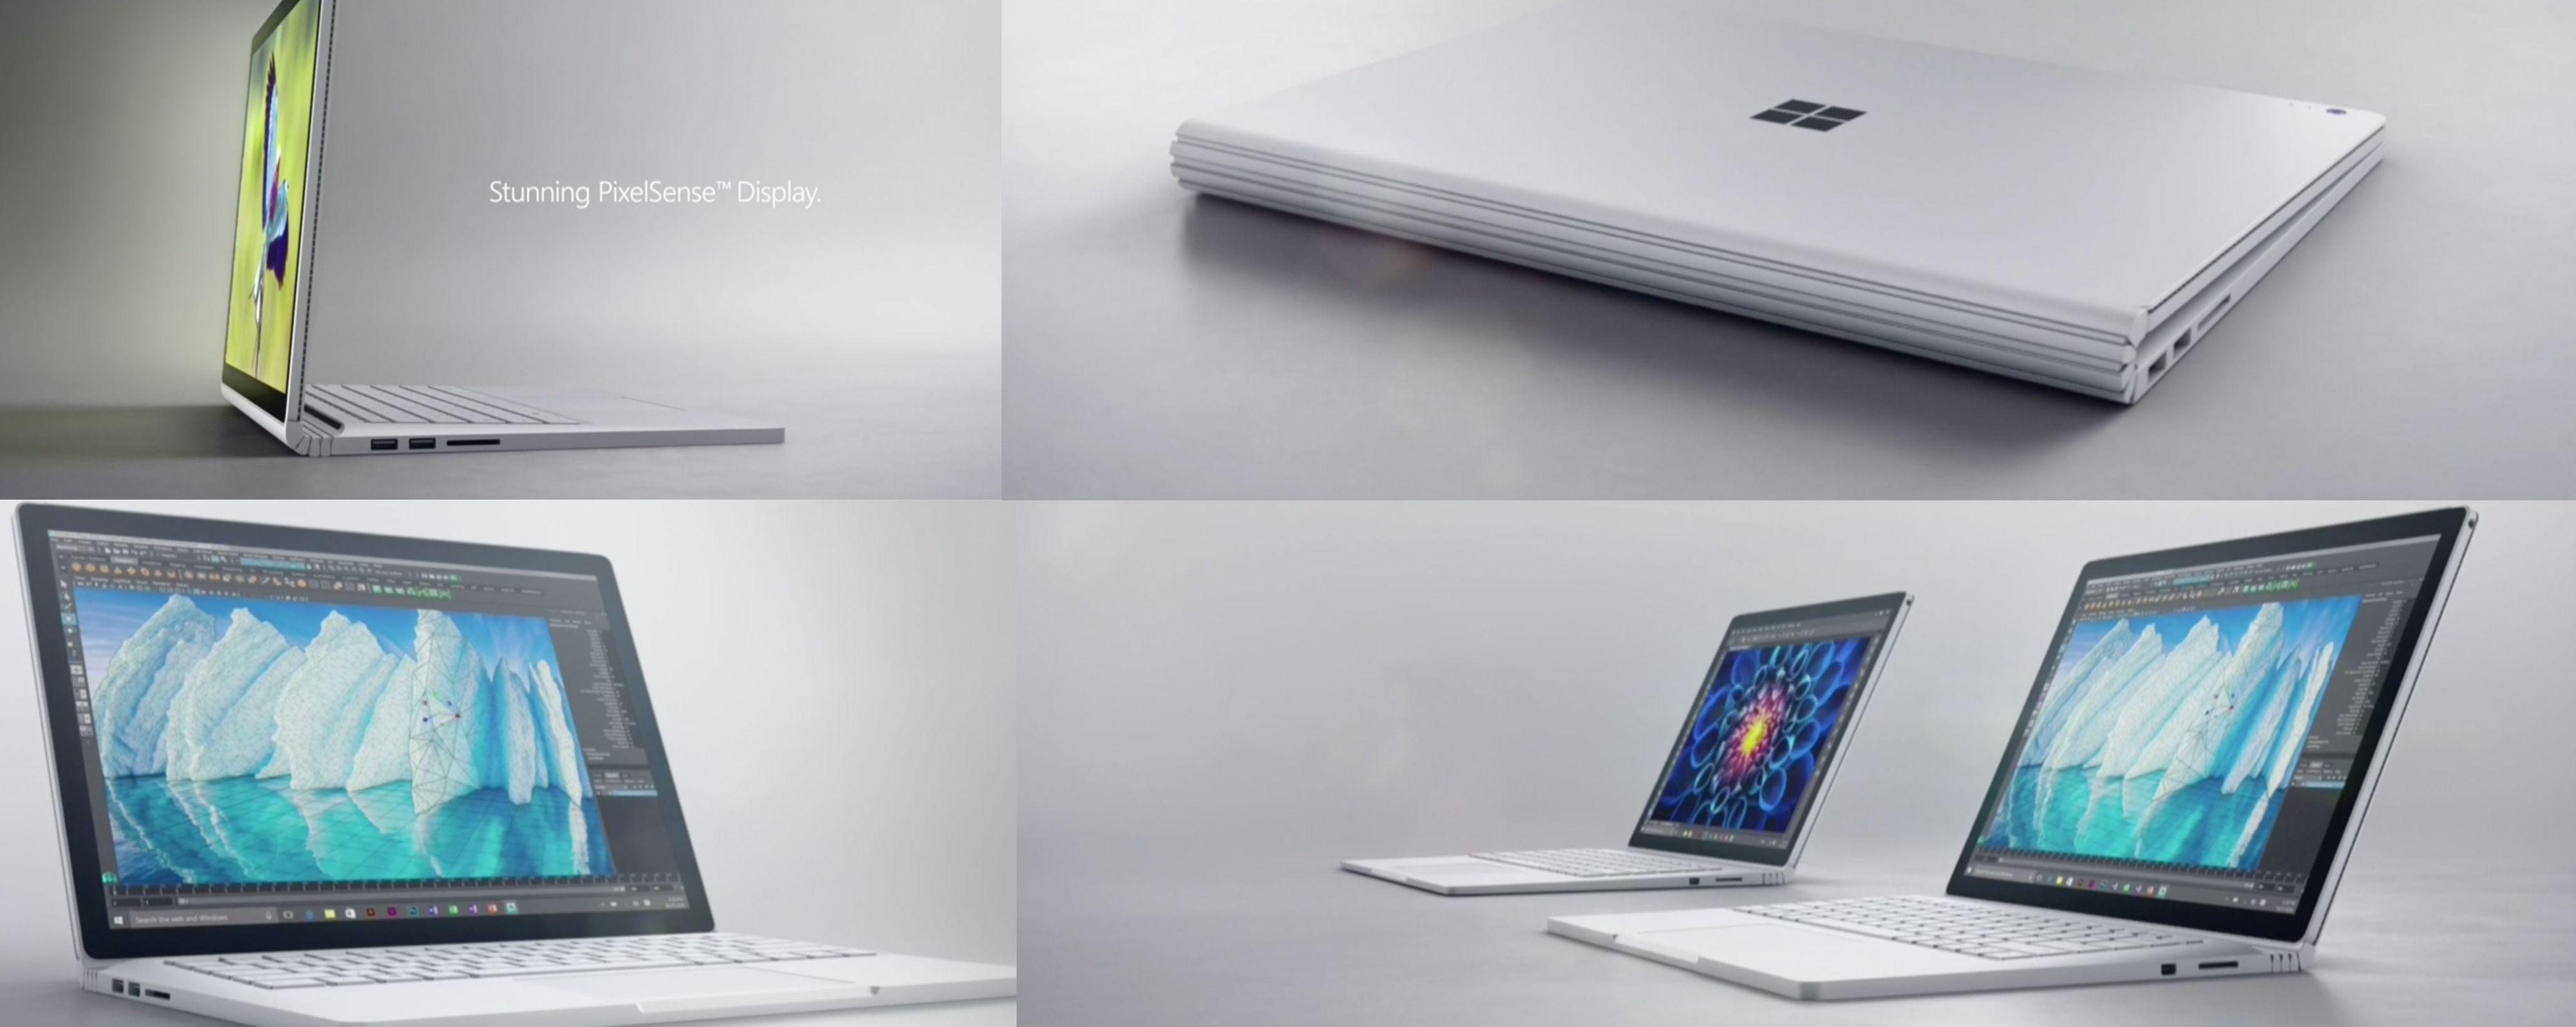 Slik ser nye Surface Book ut. Bilde: Microsoft